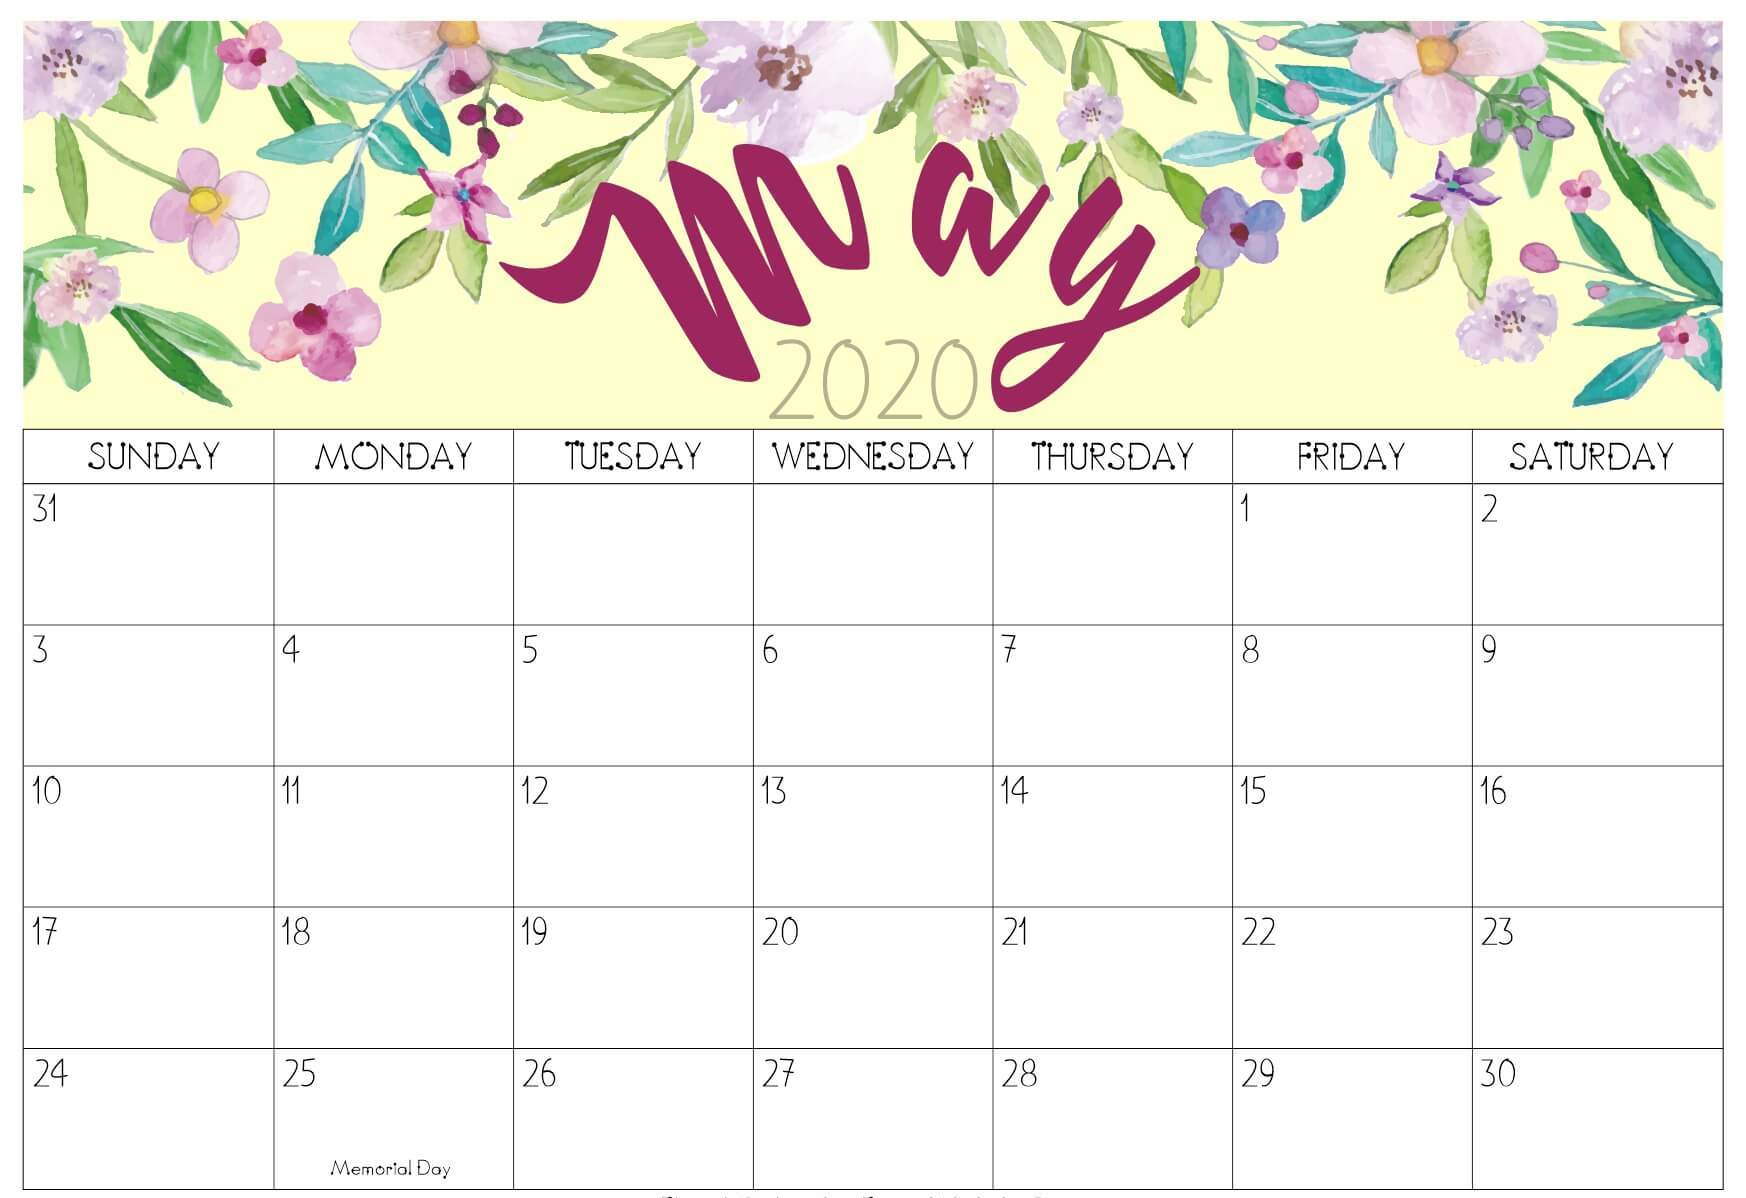 May 2020 Calendar Wallpaper for Laptop